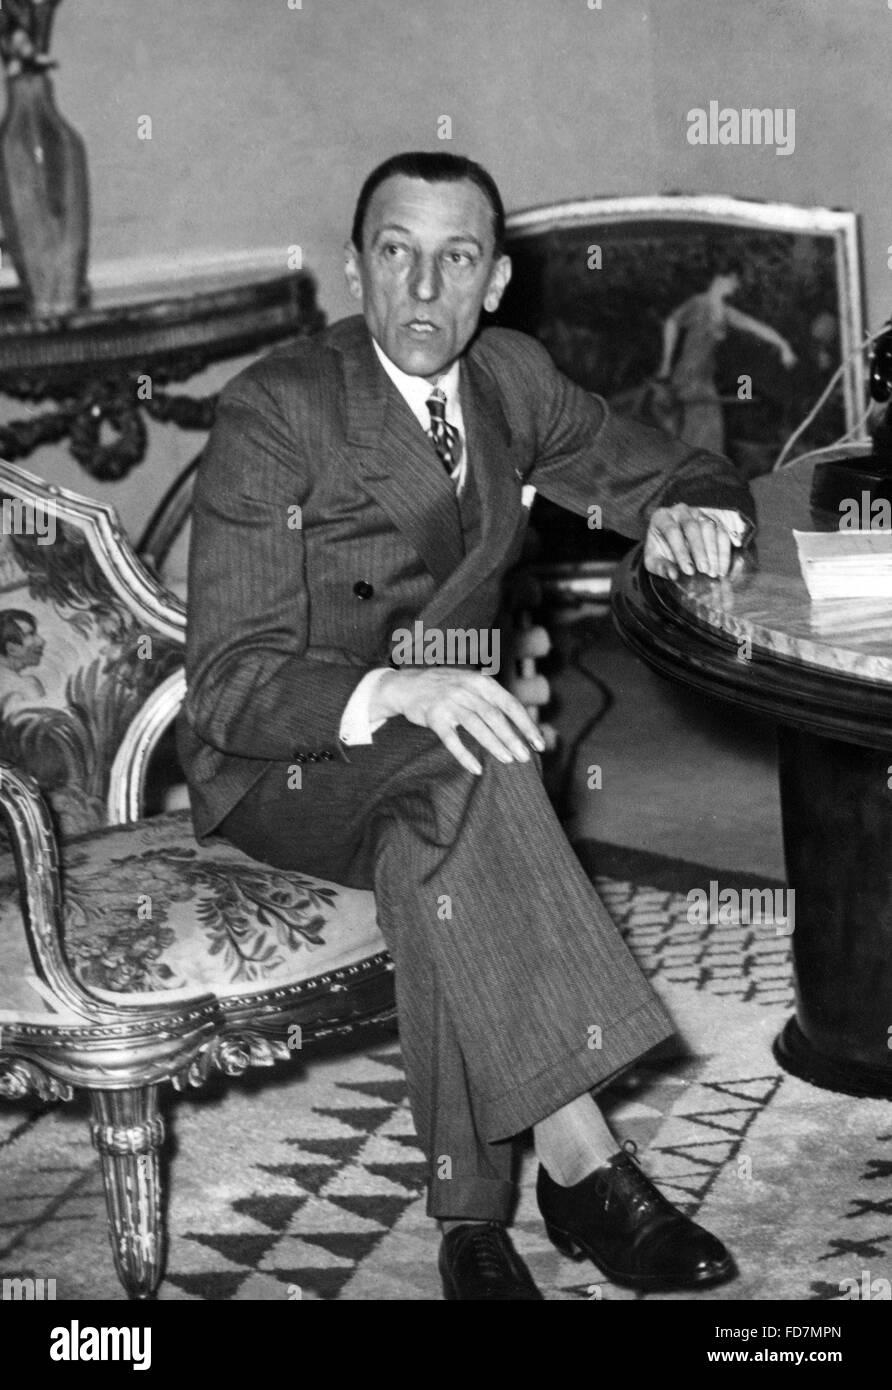 Admiral Bard, 1941 - Stock Image